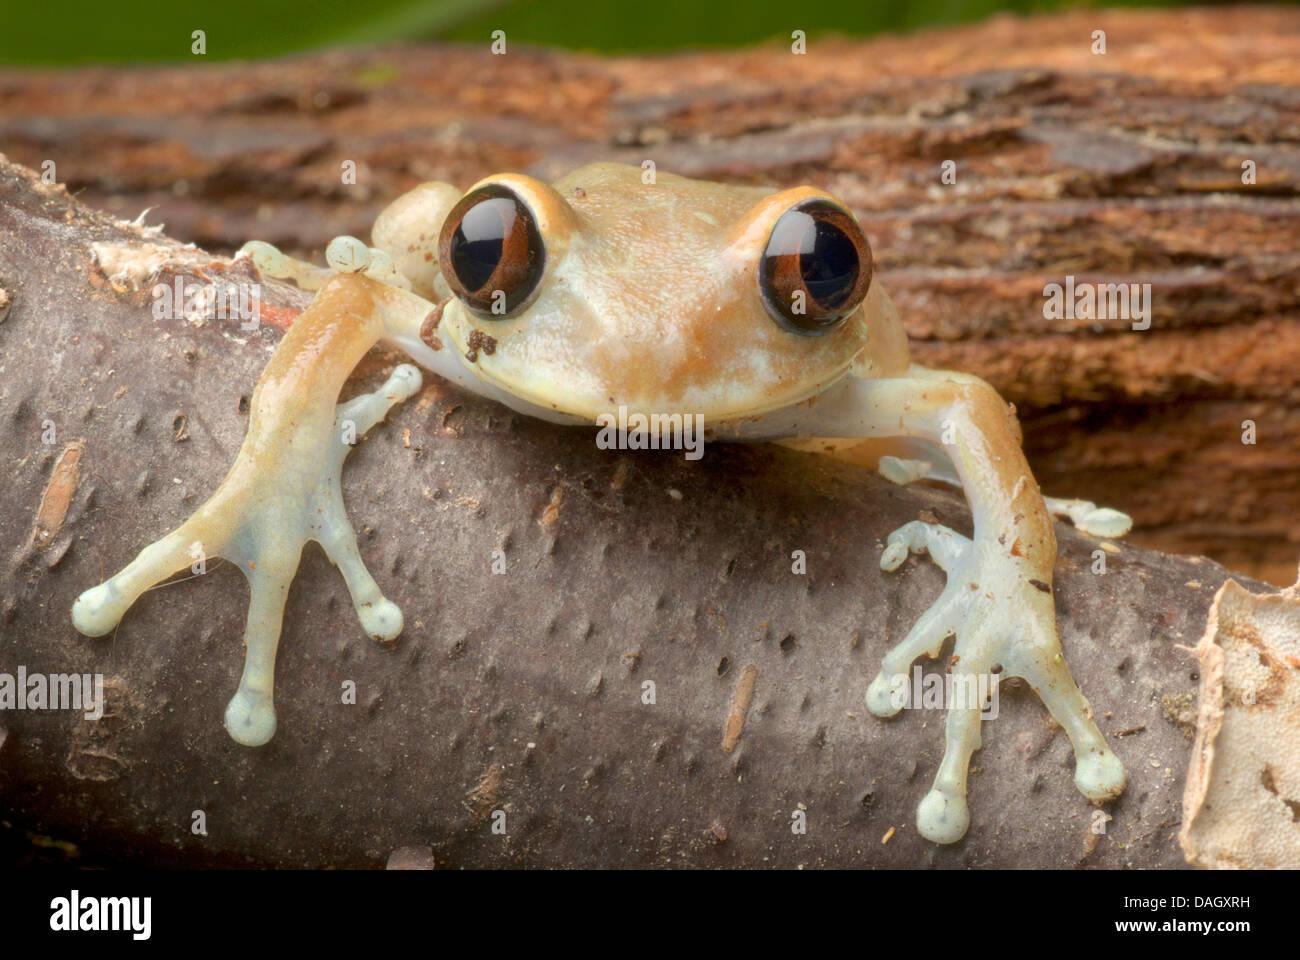 Ruby Eyed Treefrog (Leptopelis uluguruensis), view into camera - Stock Image